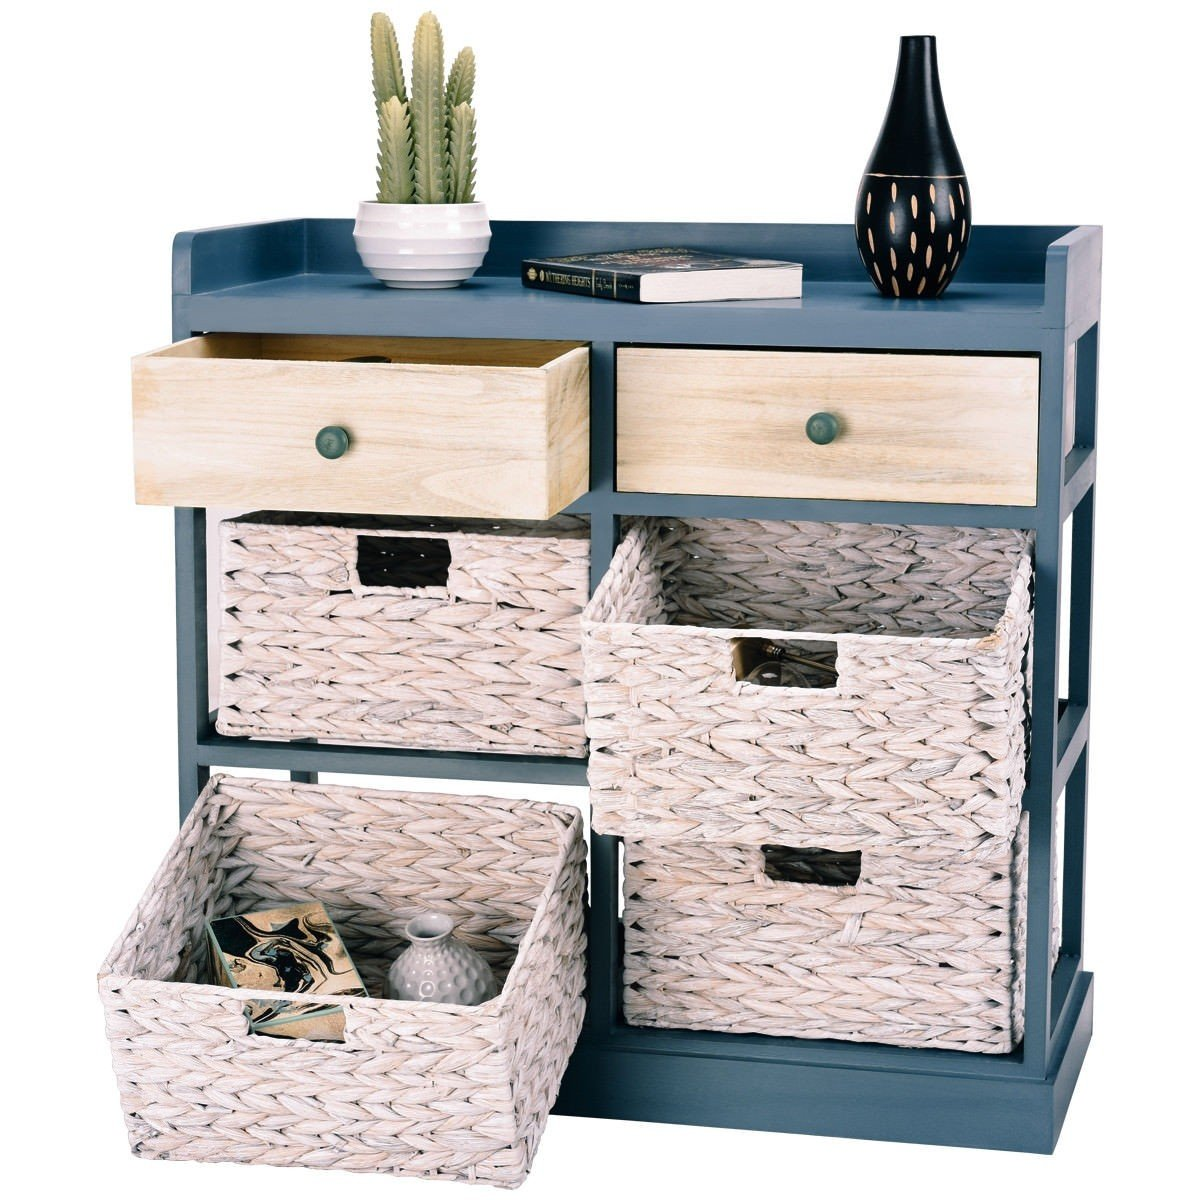 BESTChoiceForYou Cabinet Table Storage Side Wood Drawers Console Sideboard Cupboard W Furniture End Vidaxl White Baskets Drawer Door Home by BESTChoiceForYou (Image #5)